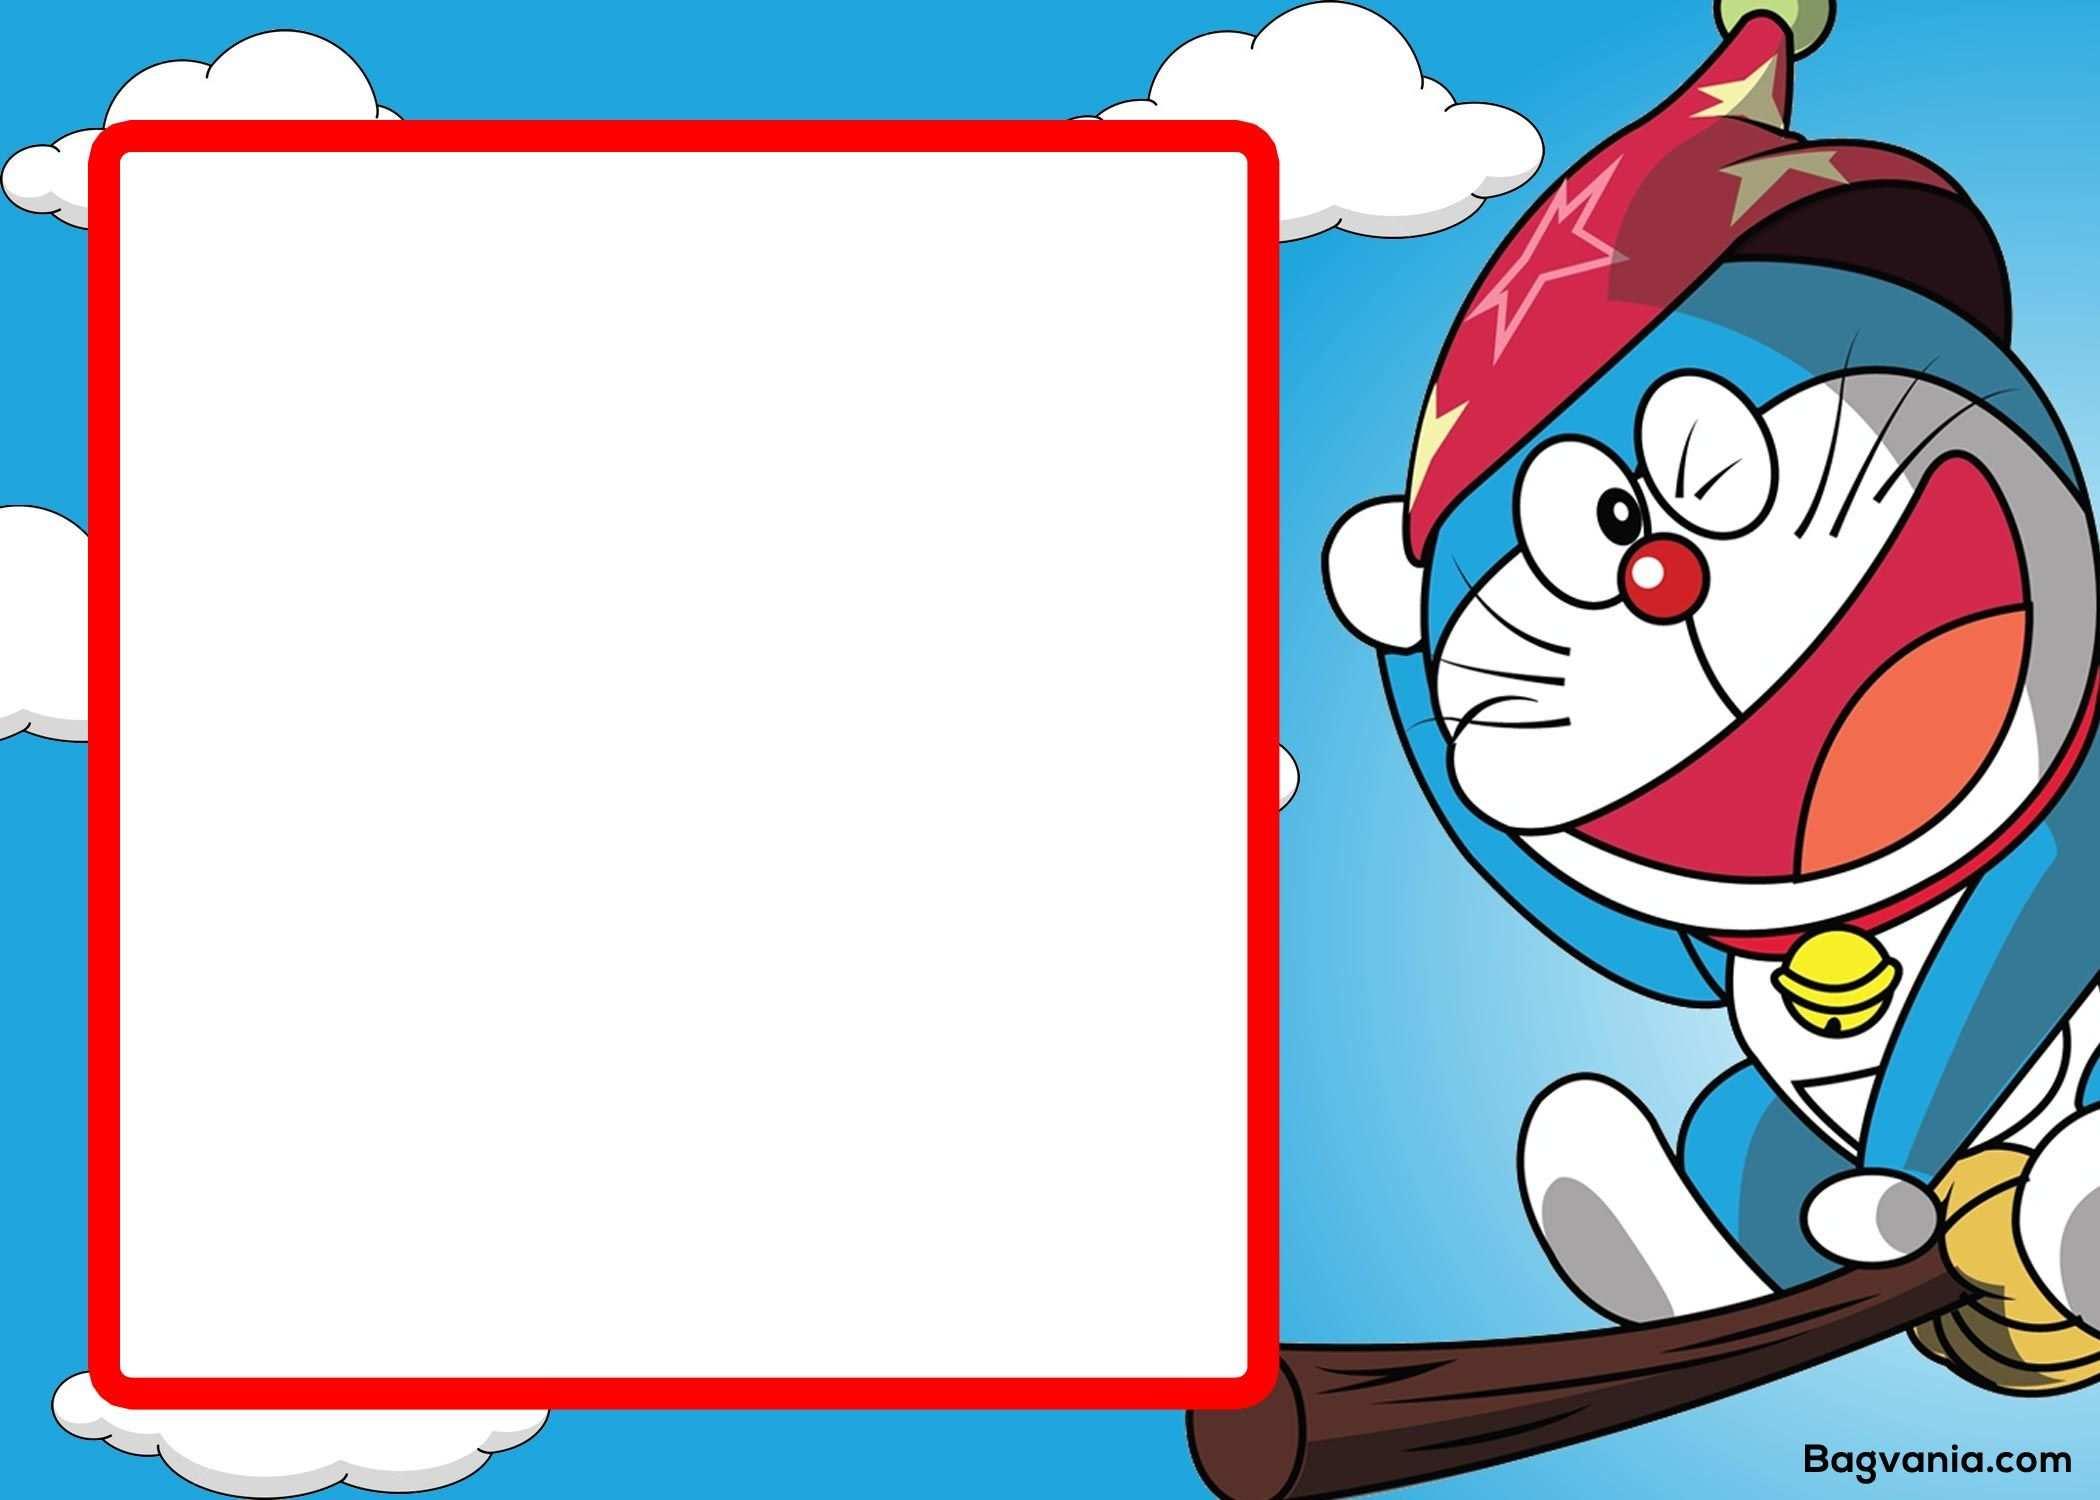 57 Printable Doraemon Birthday Invitation Template in Photoshop with Doraemon Birthday Invitation Template